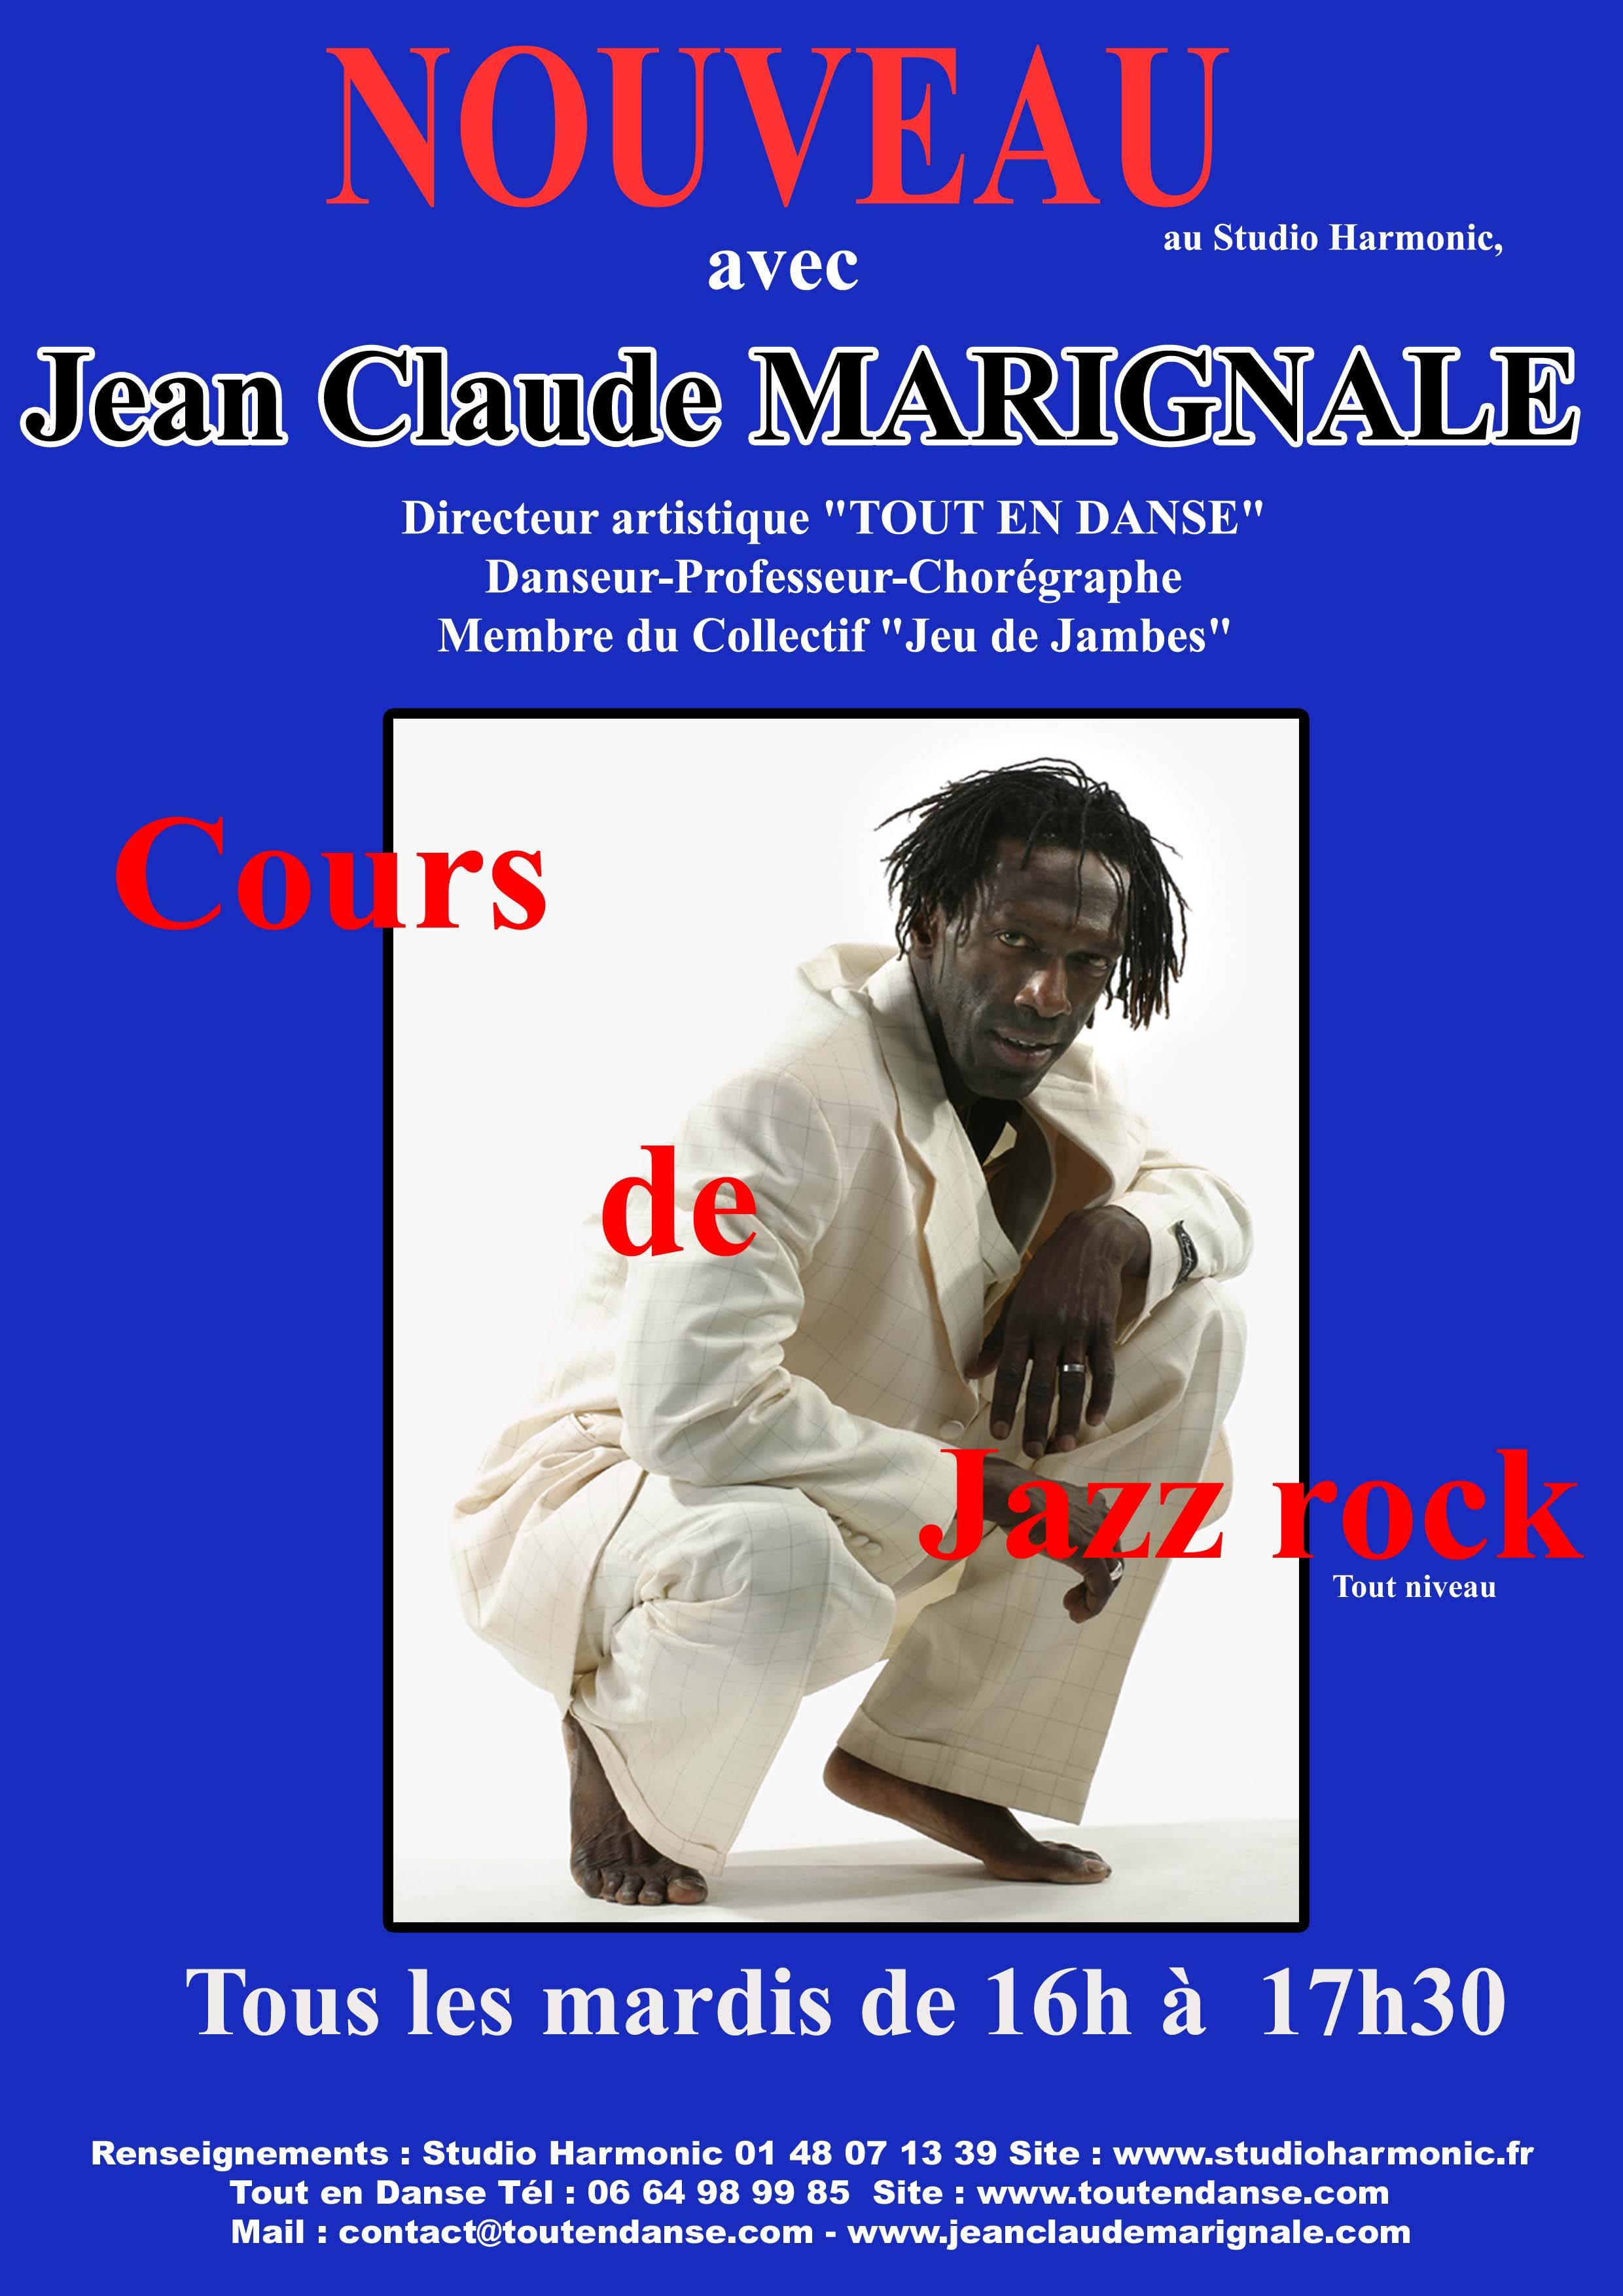 cours-jazz-rock-mardi-harmonic-2008-2009-aplatie.jpg